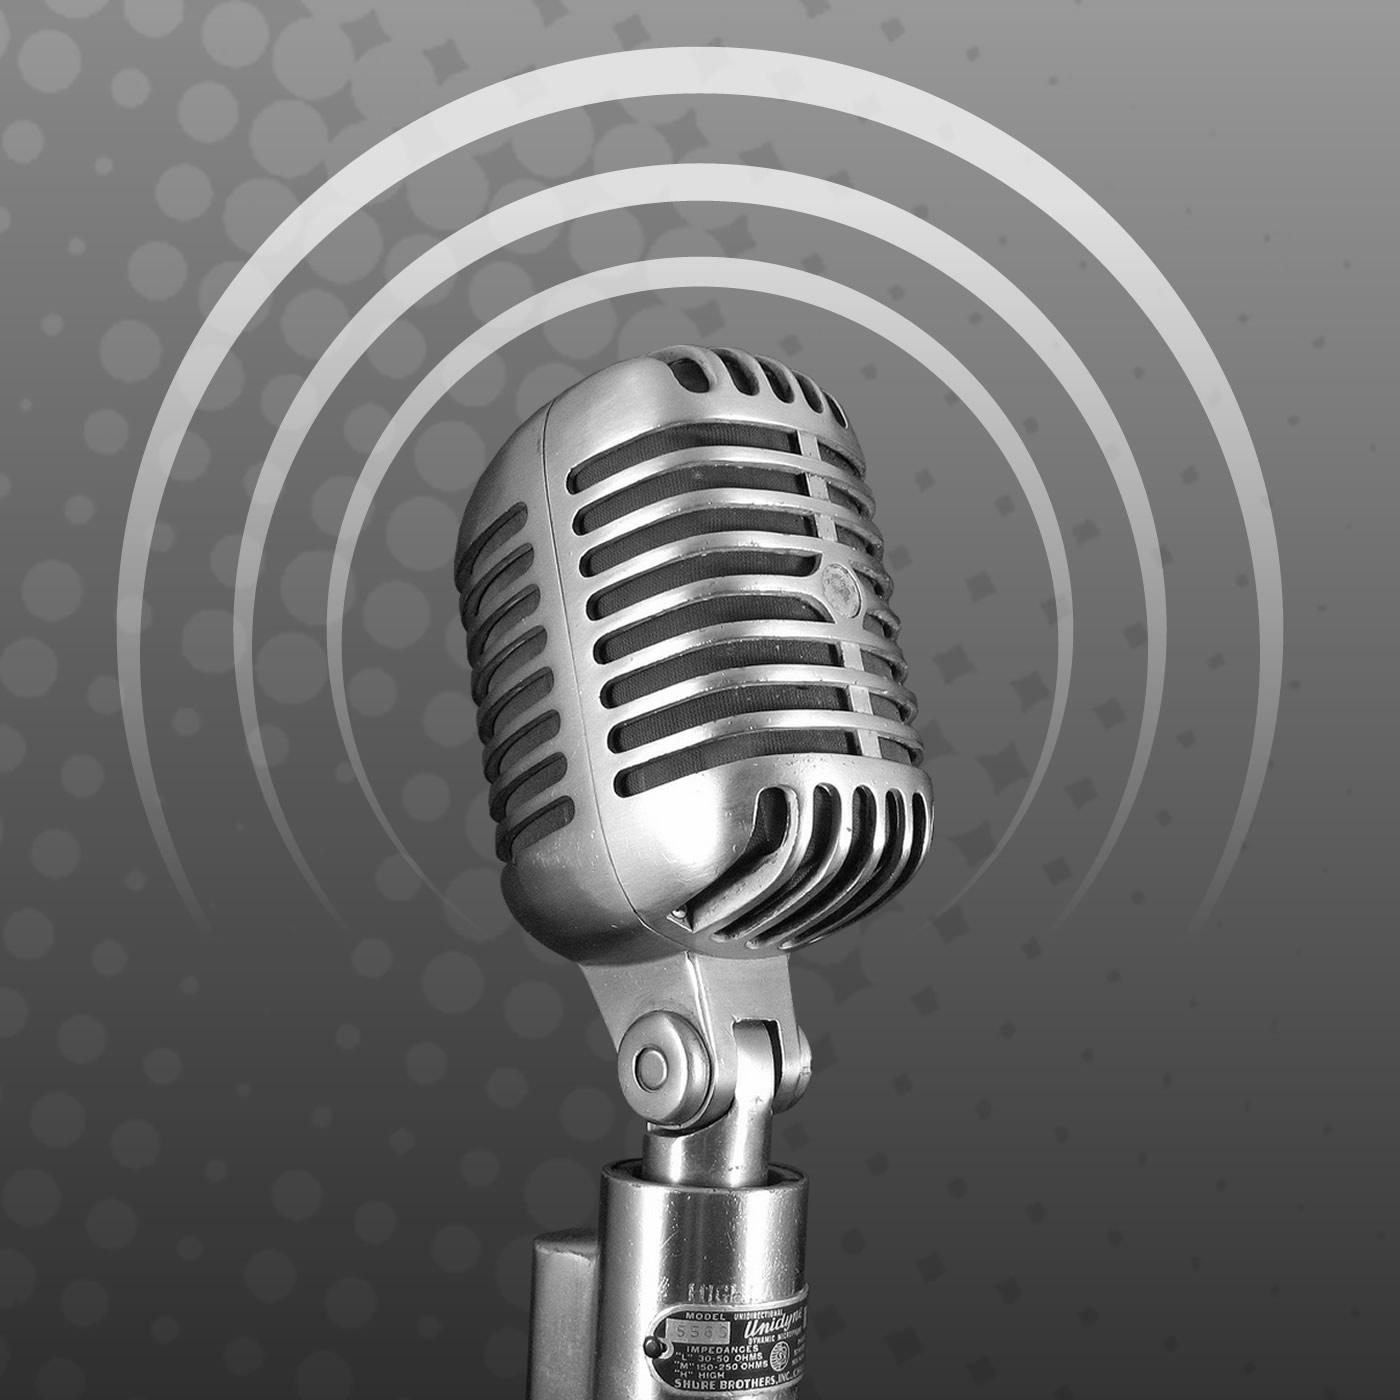 New Song Christian Fellowship's Podcast